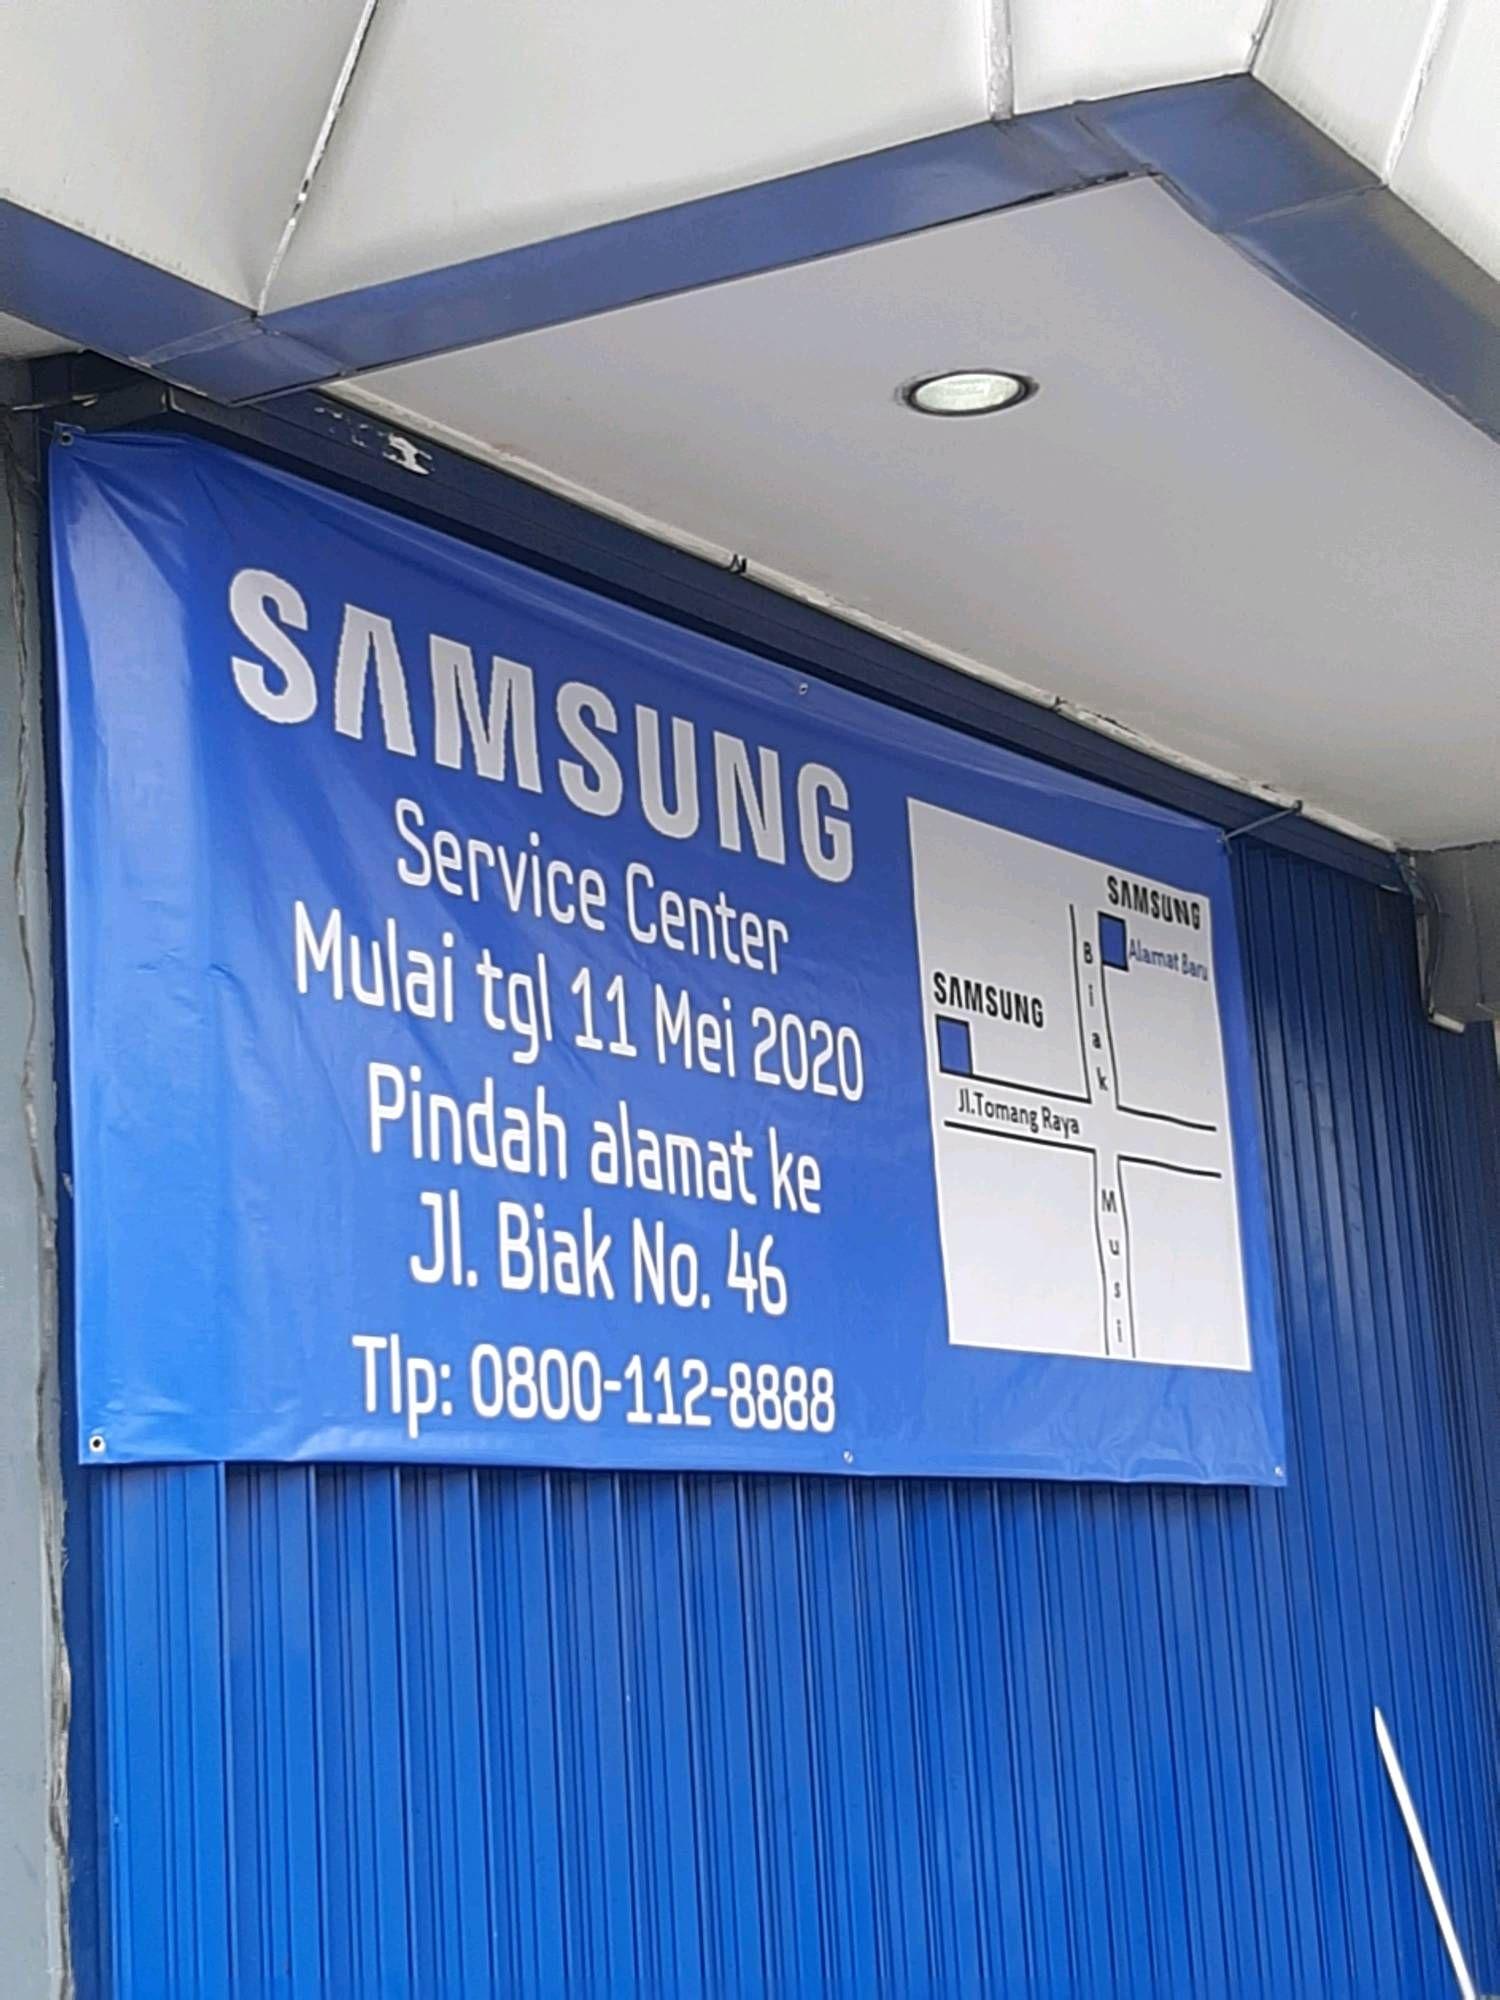 Service Center Samsung Itc Kuningan